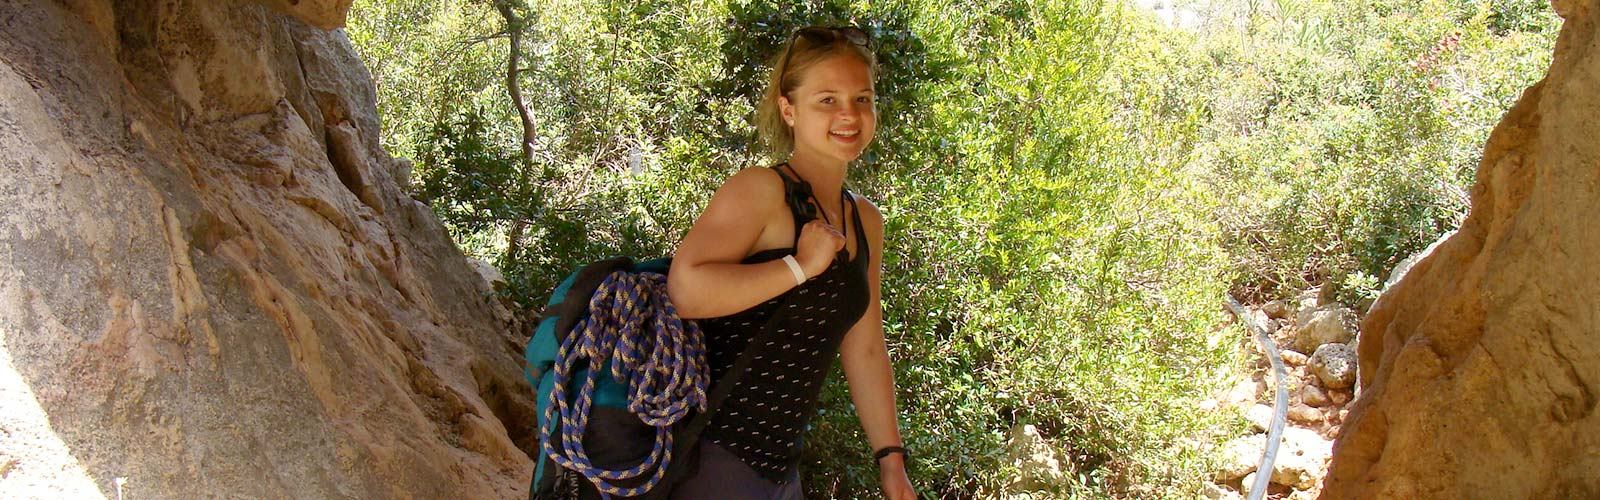 School trips abroad in Crete